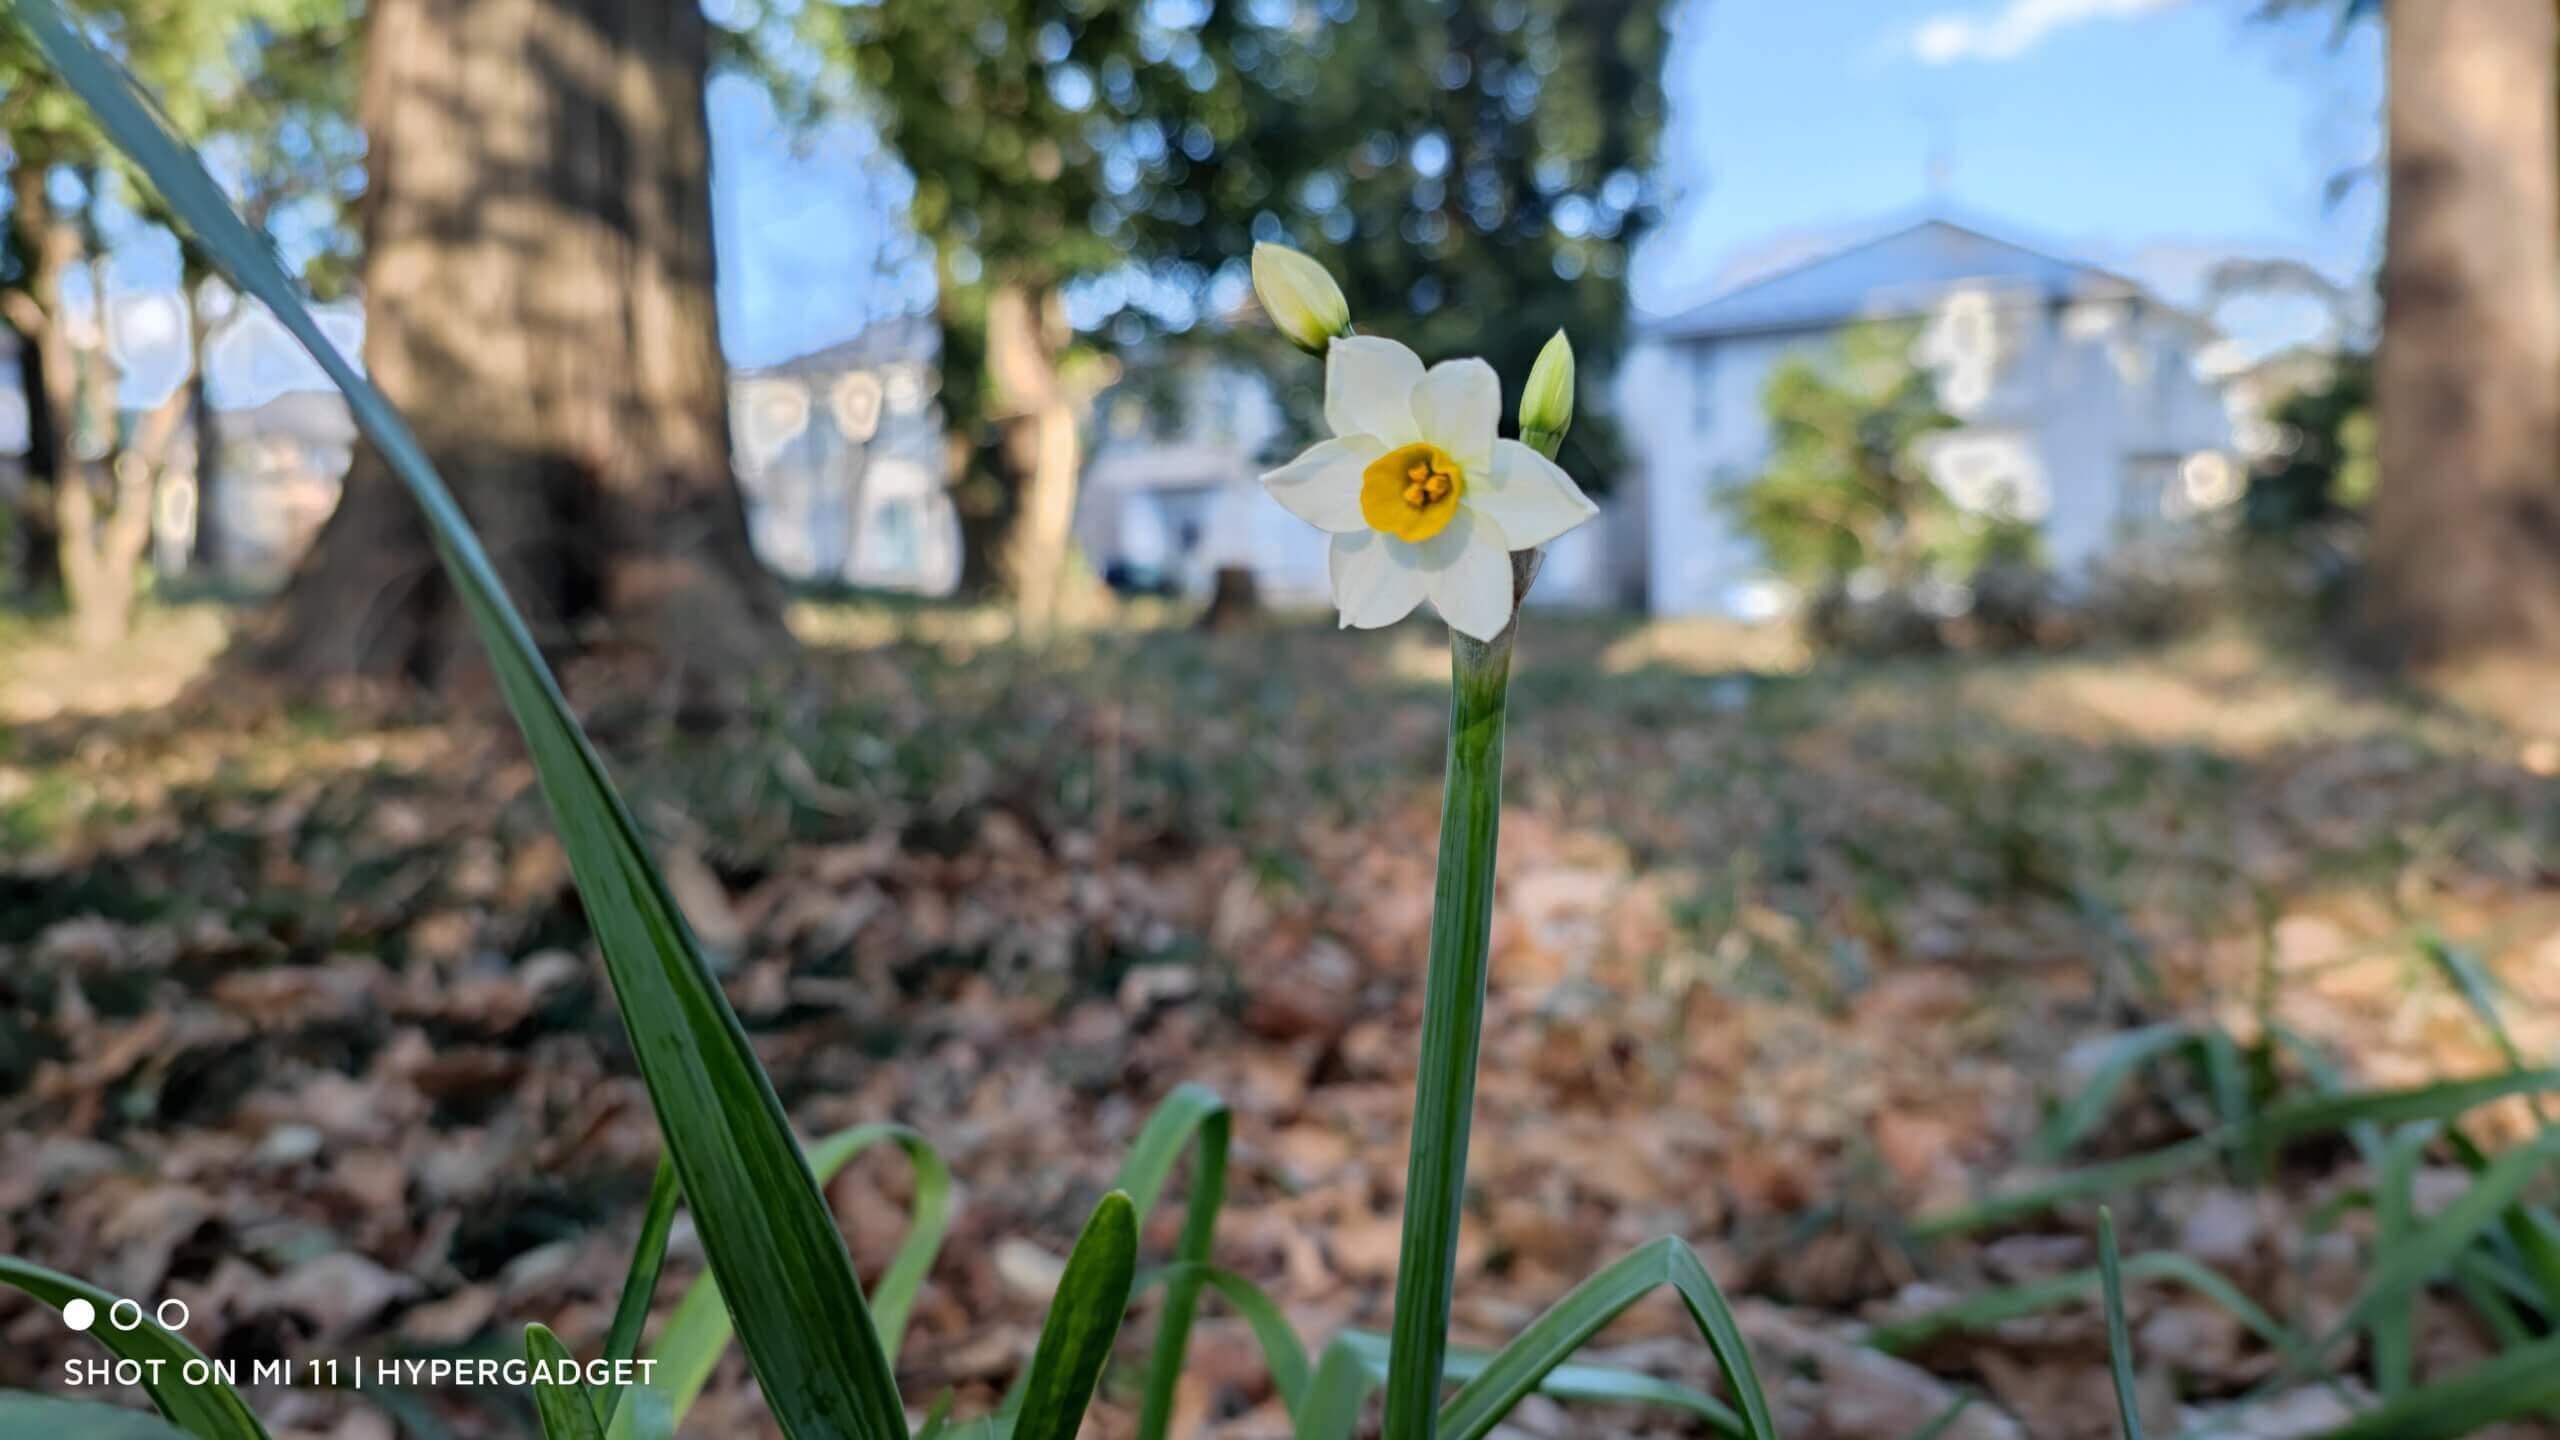 Xiaomi Mi 11で撮影した花の写真